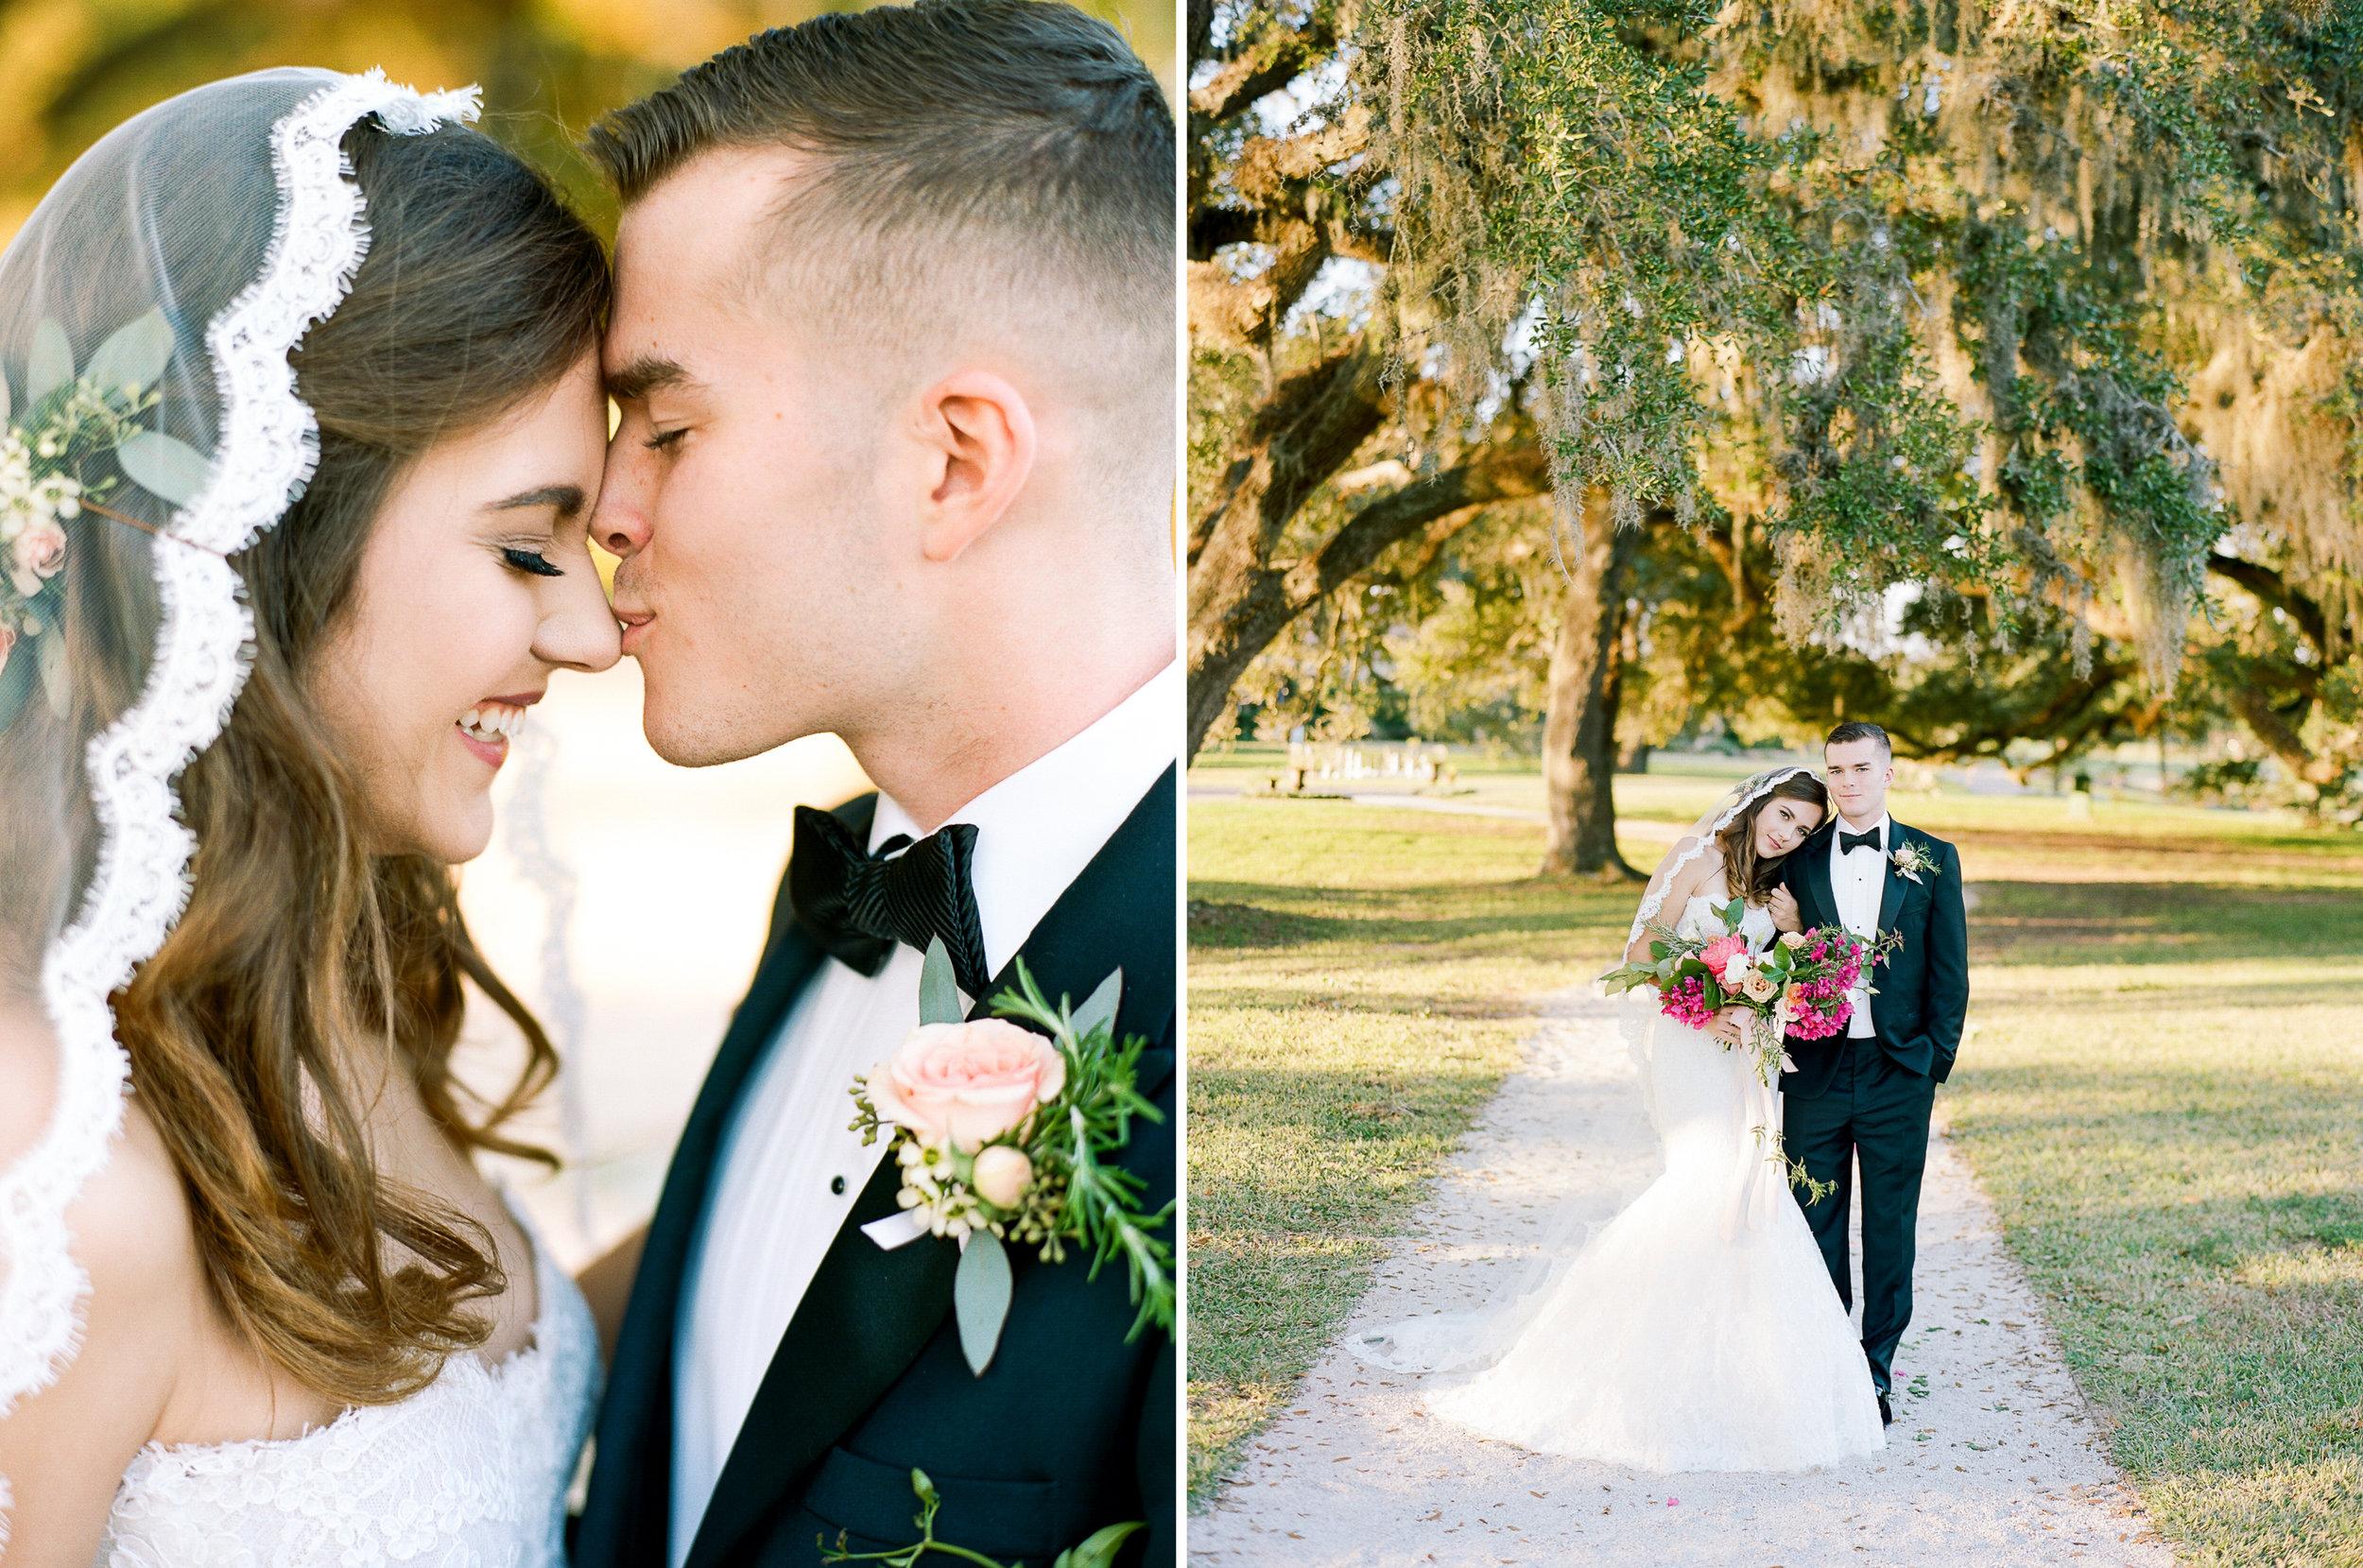 Top-Houston-Wedding-Photographer-Dana-Fernandez-Photography-The-Clubs-At-Houston-Oaks-Country-Club-Belle-Events-Film-Fine-Art-Destination-104.jpg